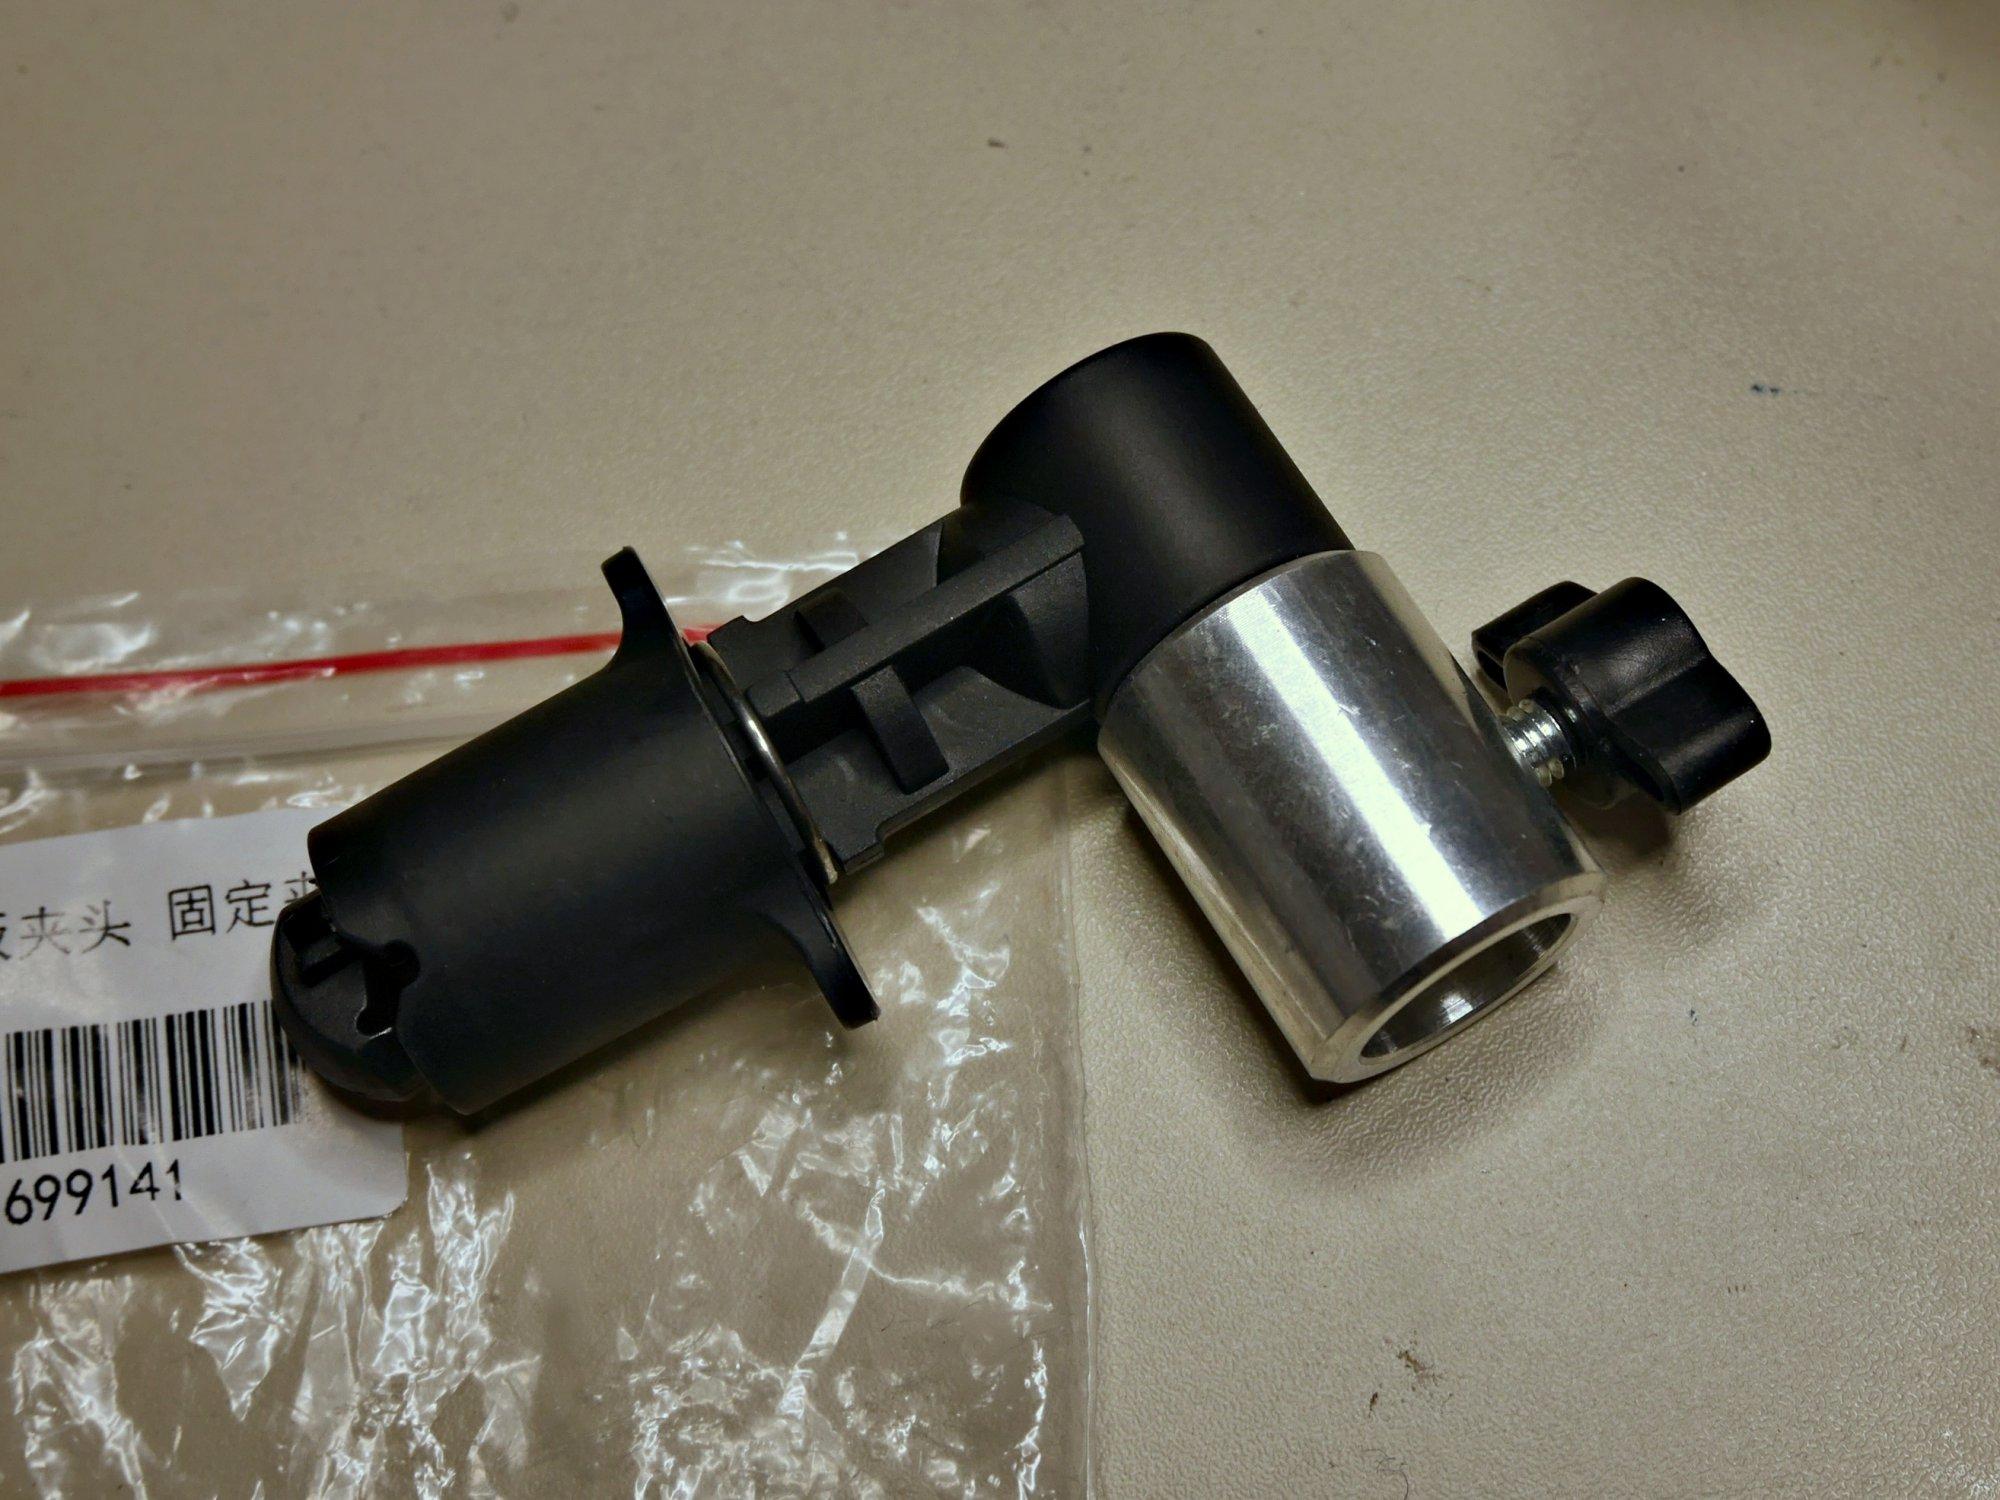 Original generic clamp - adapting daylight white Chinese LED floodlights for studio use.